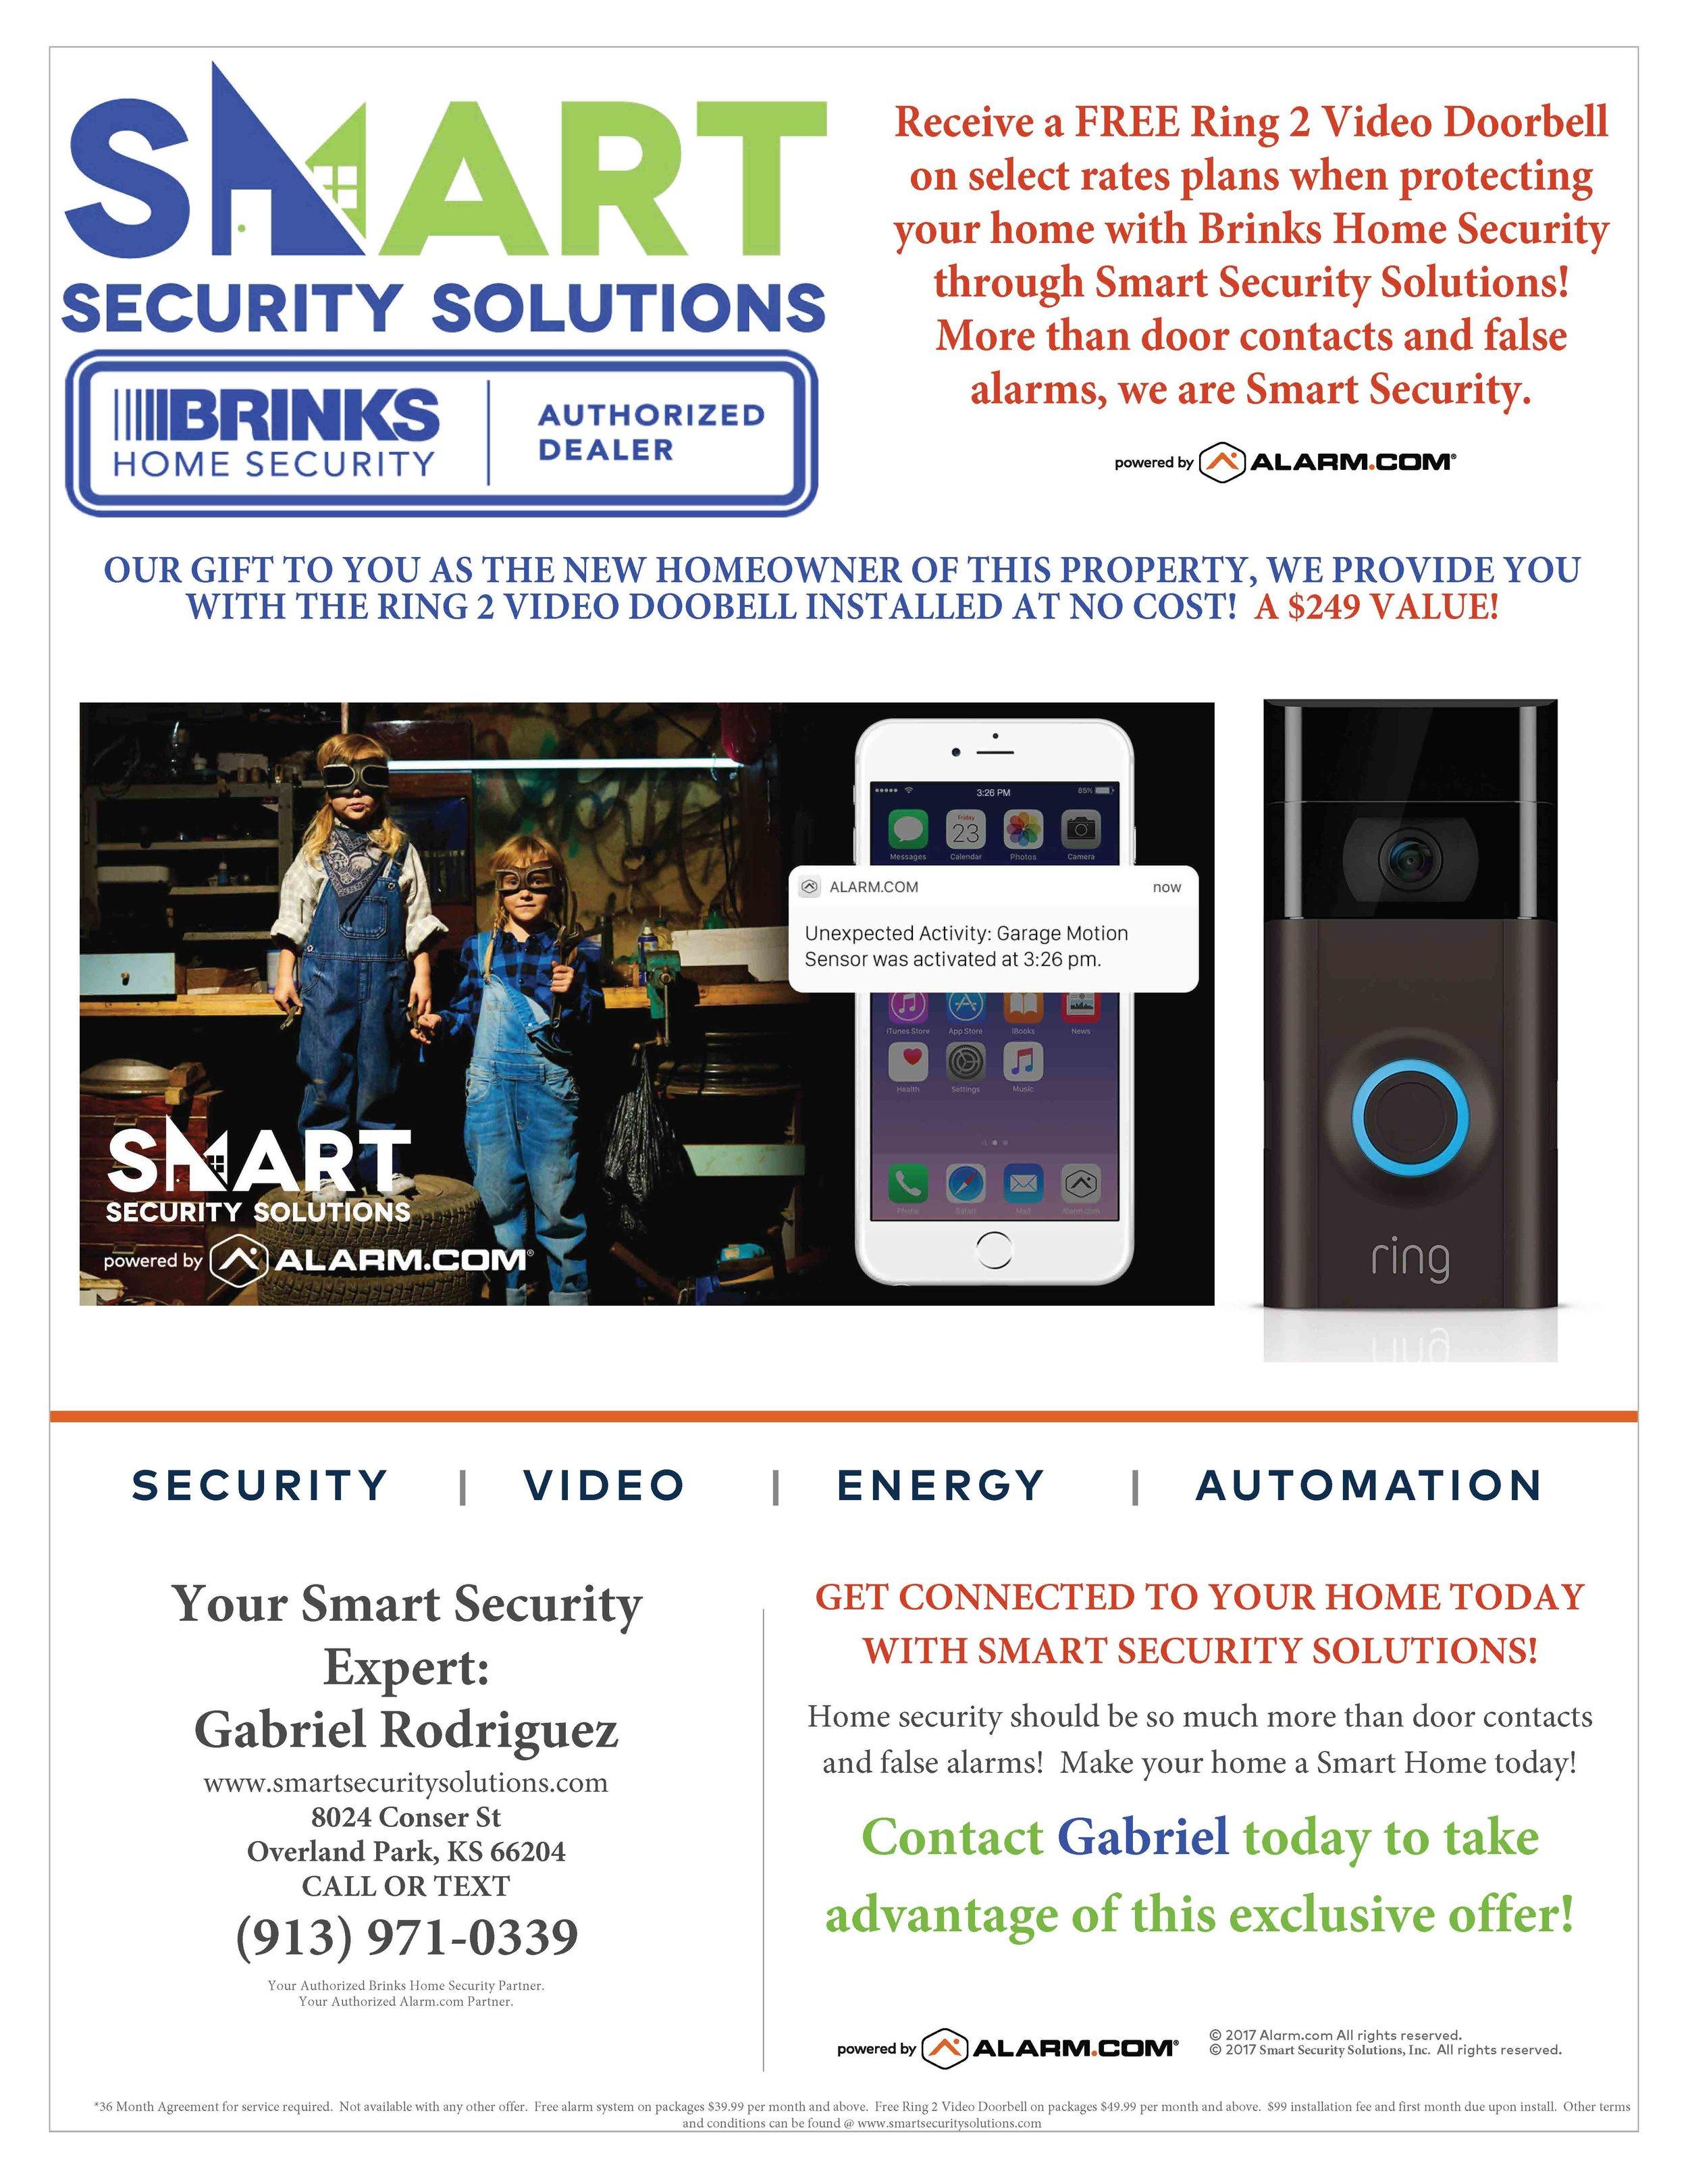 Brinks - Smart Security Flyer - GABE.jpg